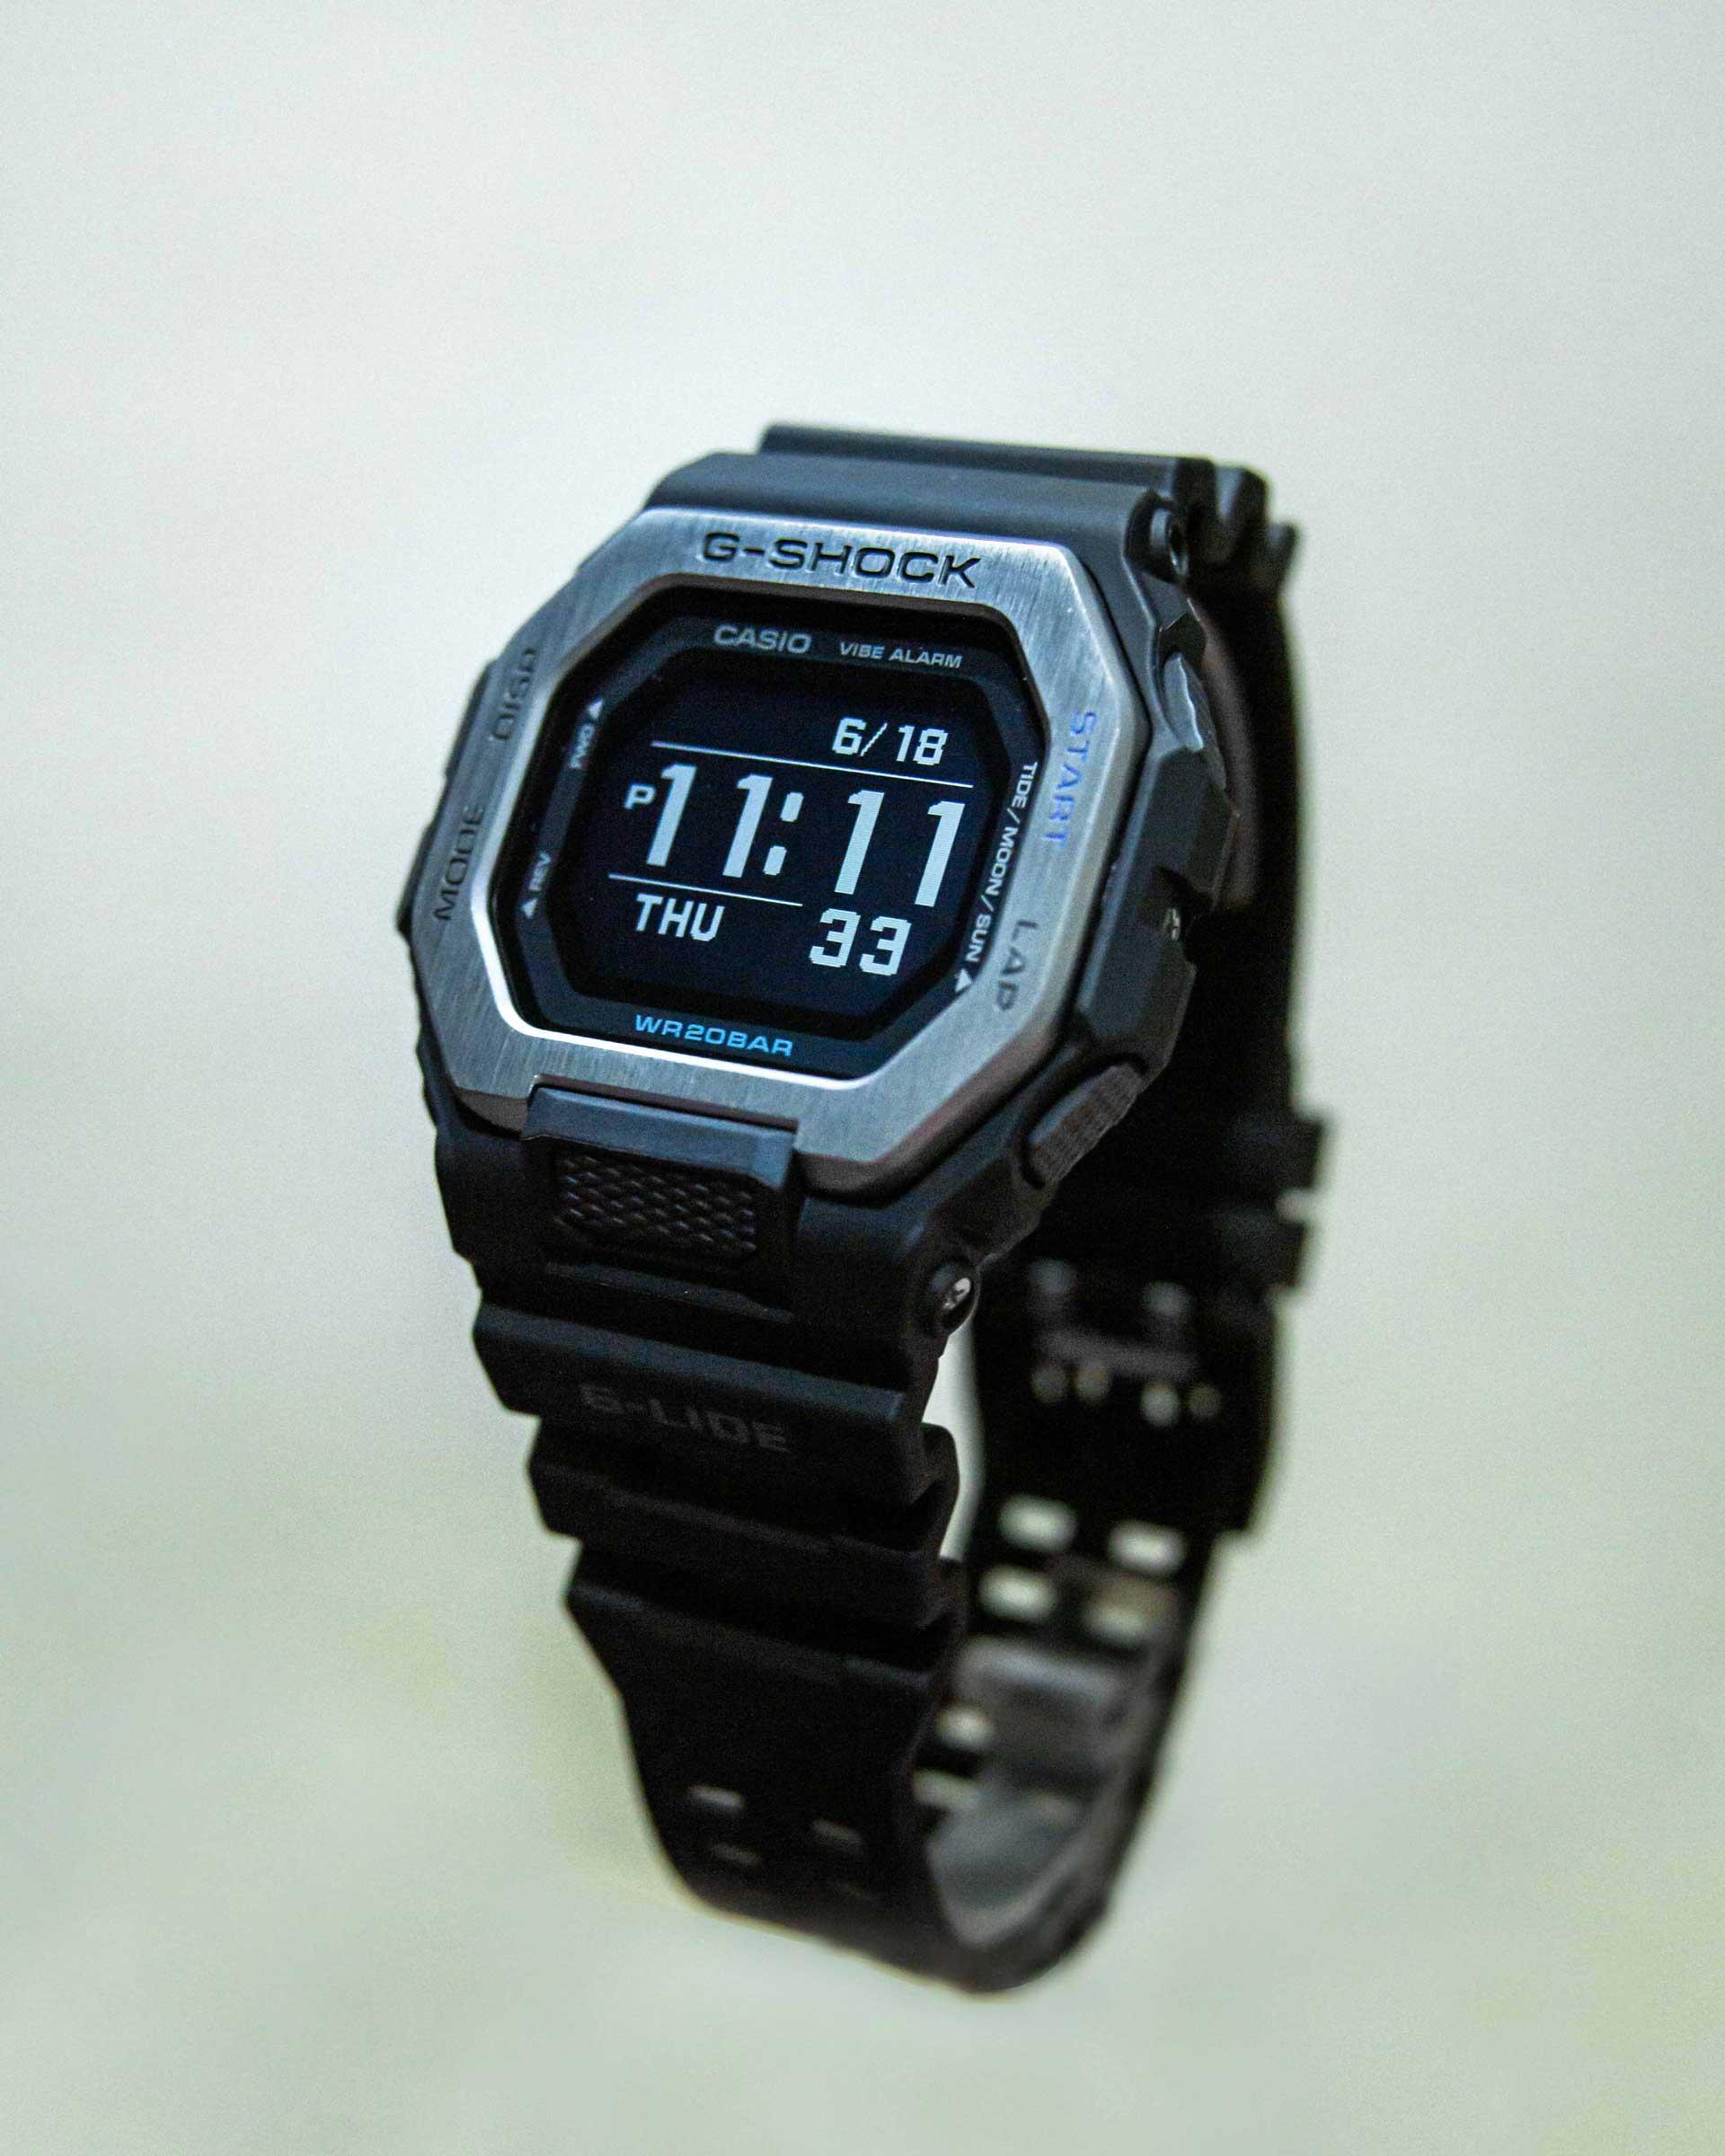 Casio G-SHOCK GBX-100-1